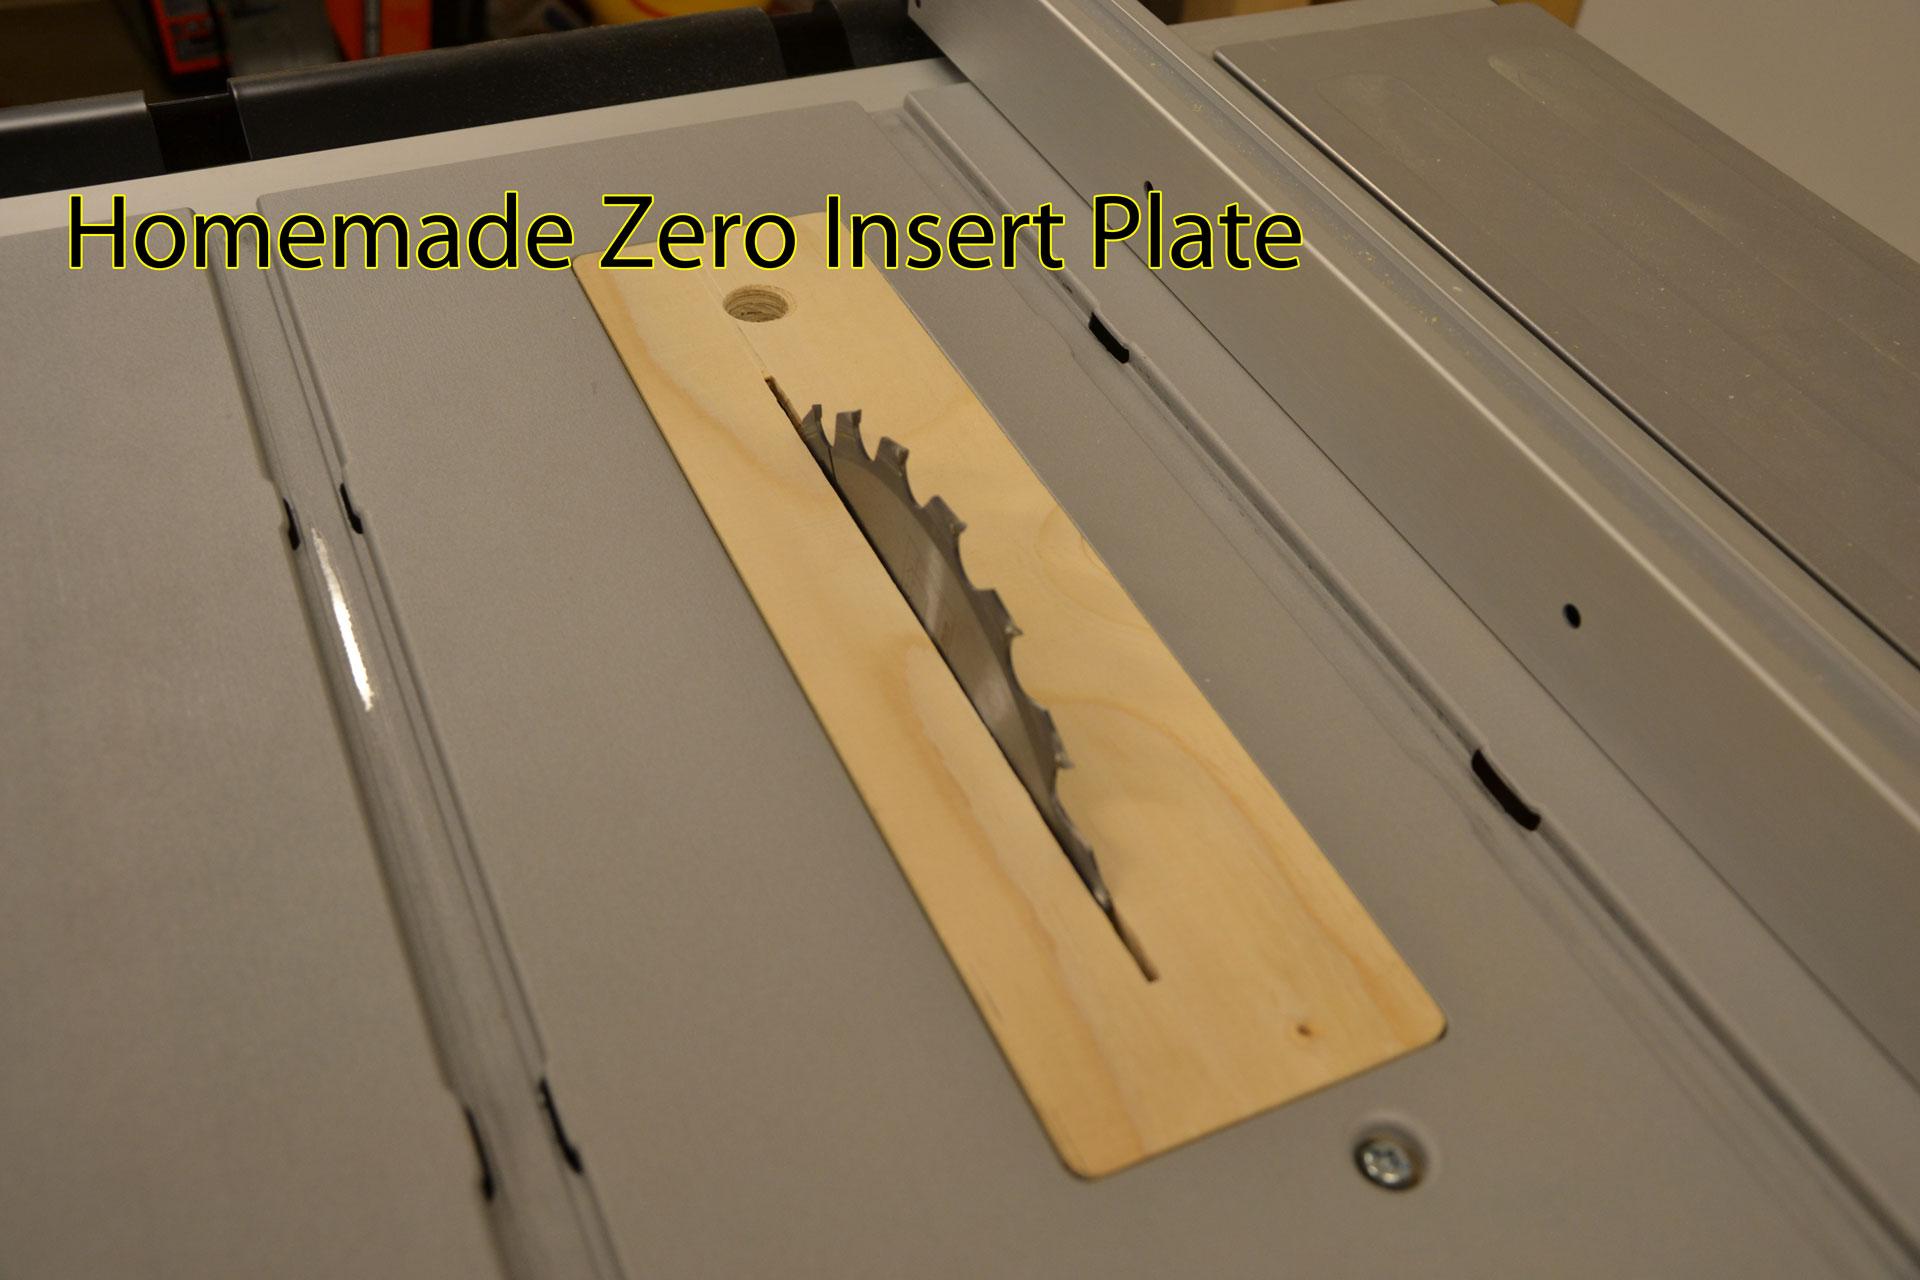 Zero insert